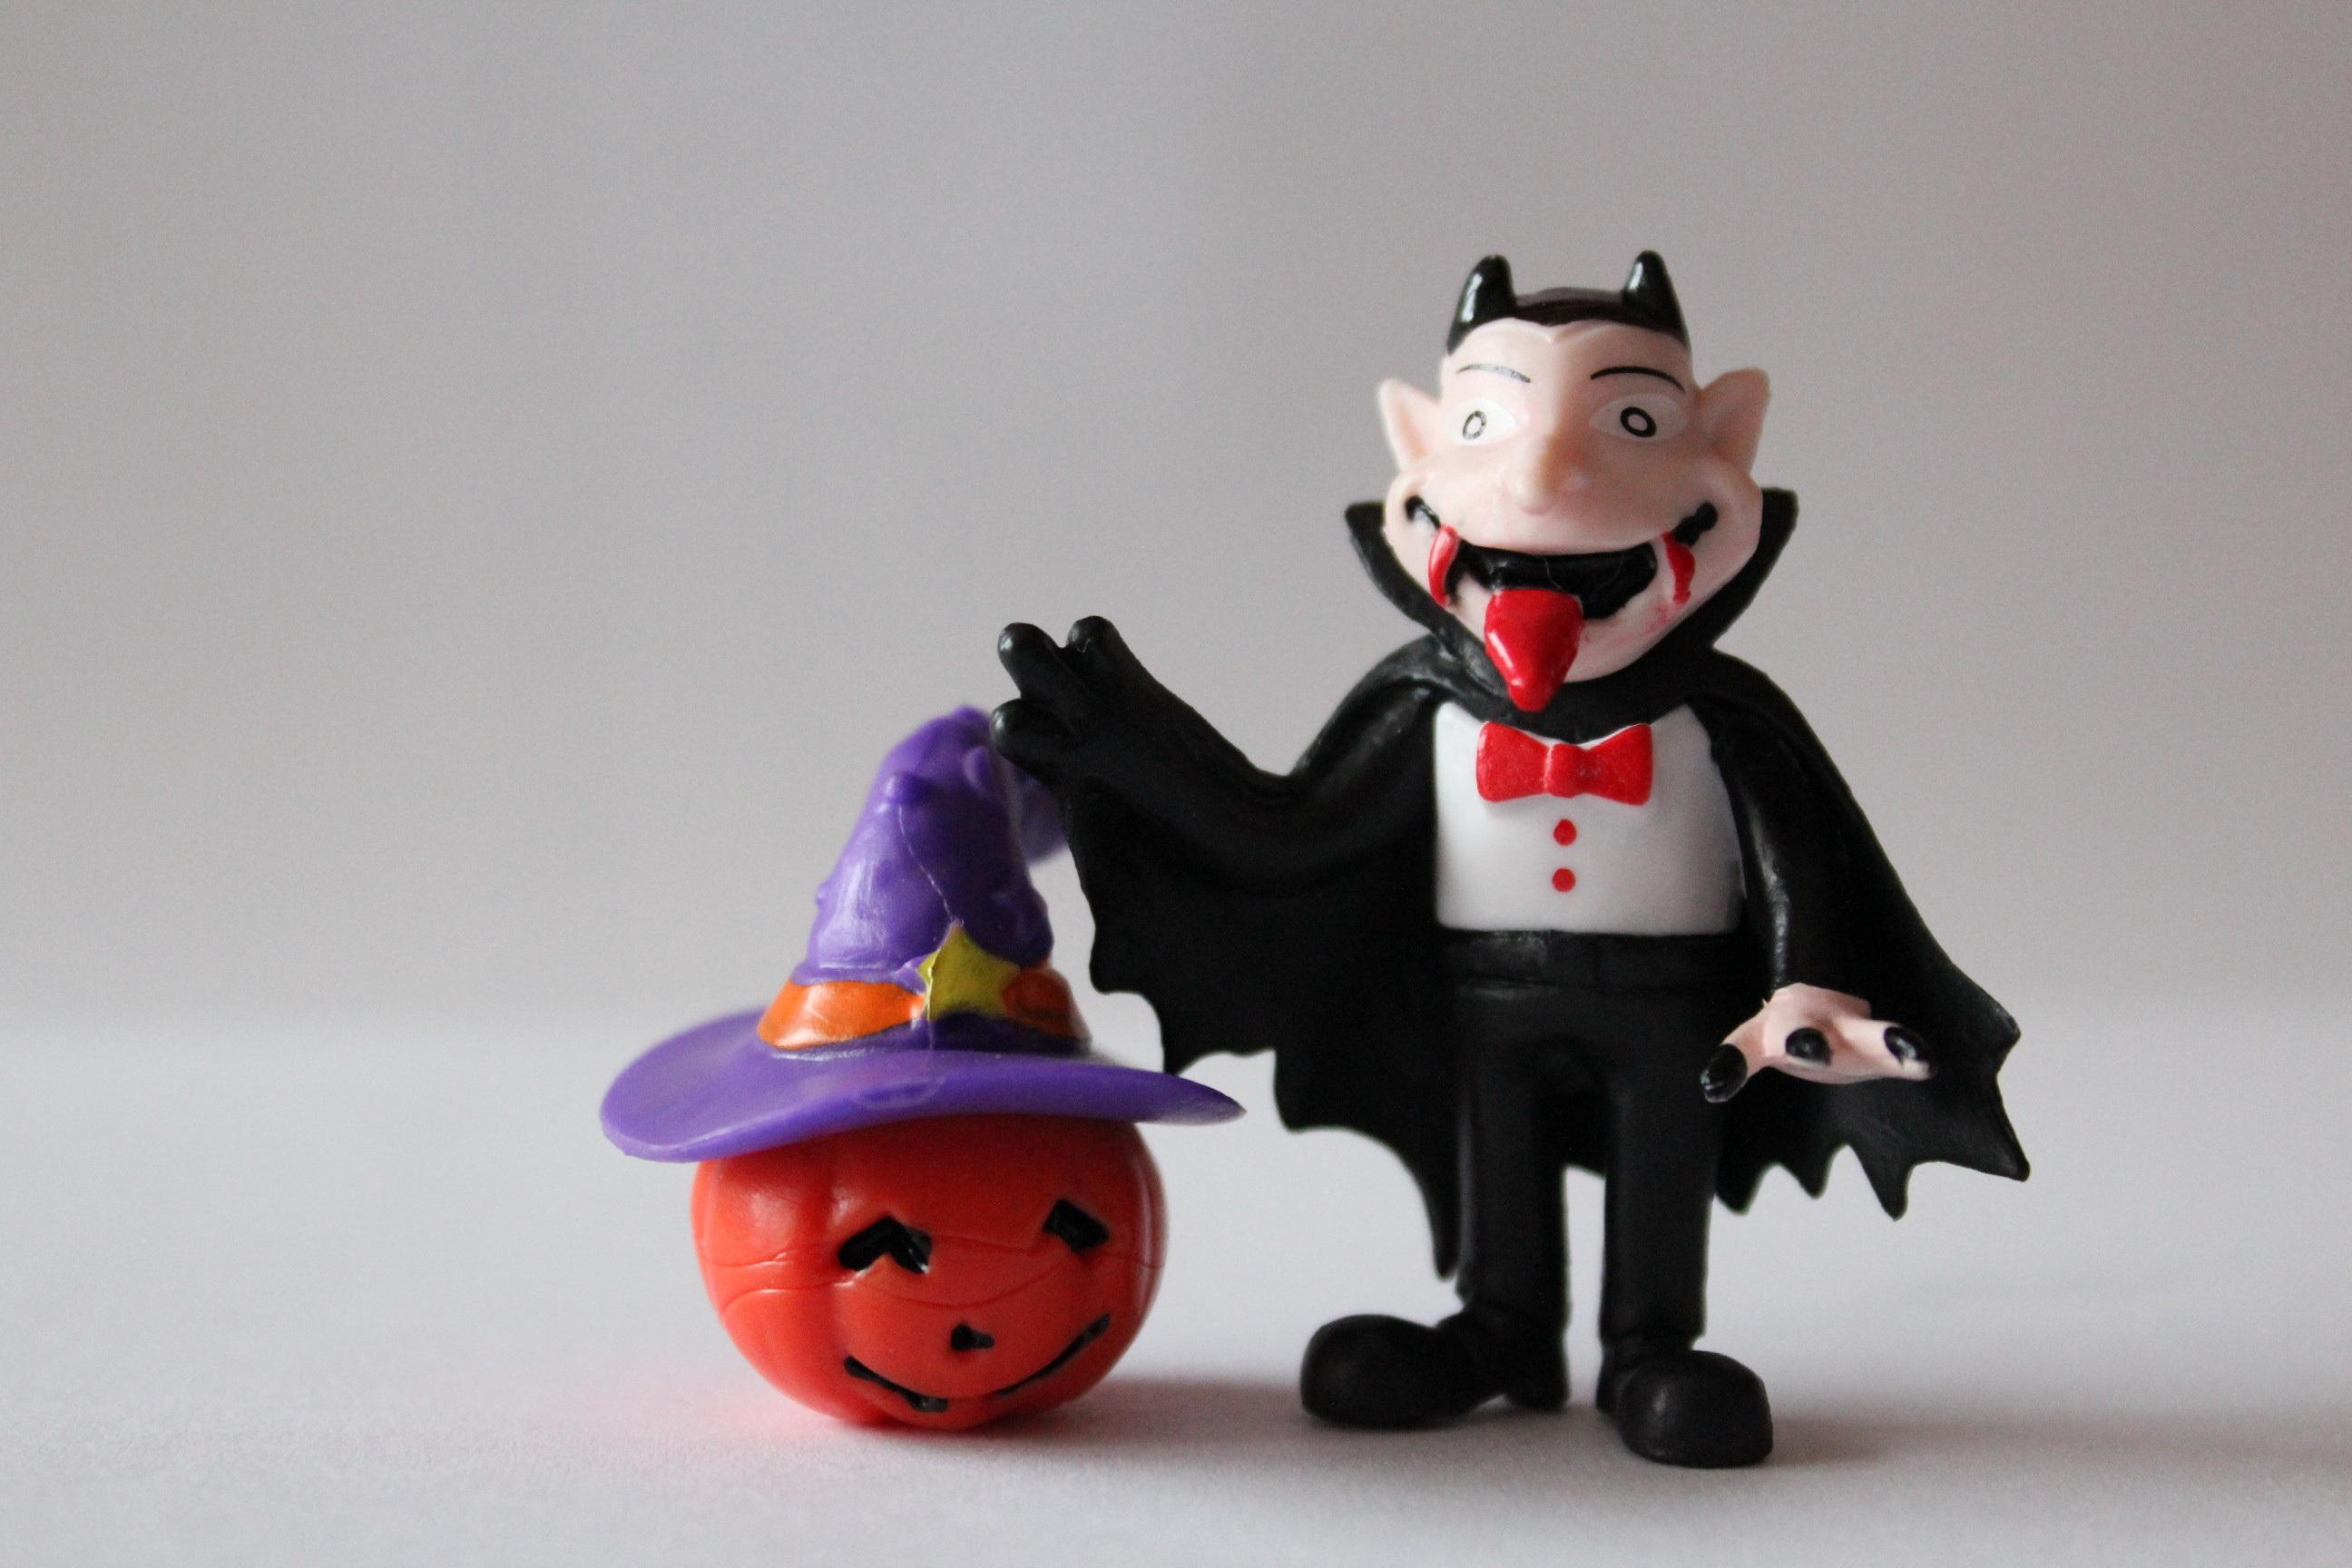 Gambar Halloween Mainan Mengerikan Darah Arca Menyeramkan